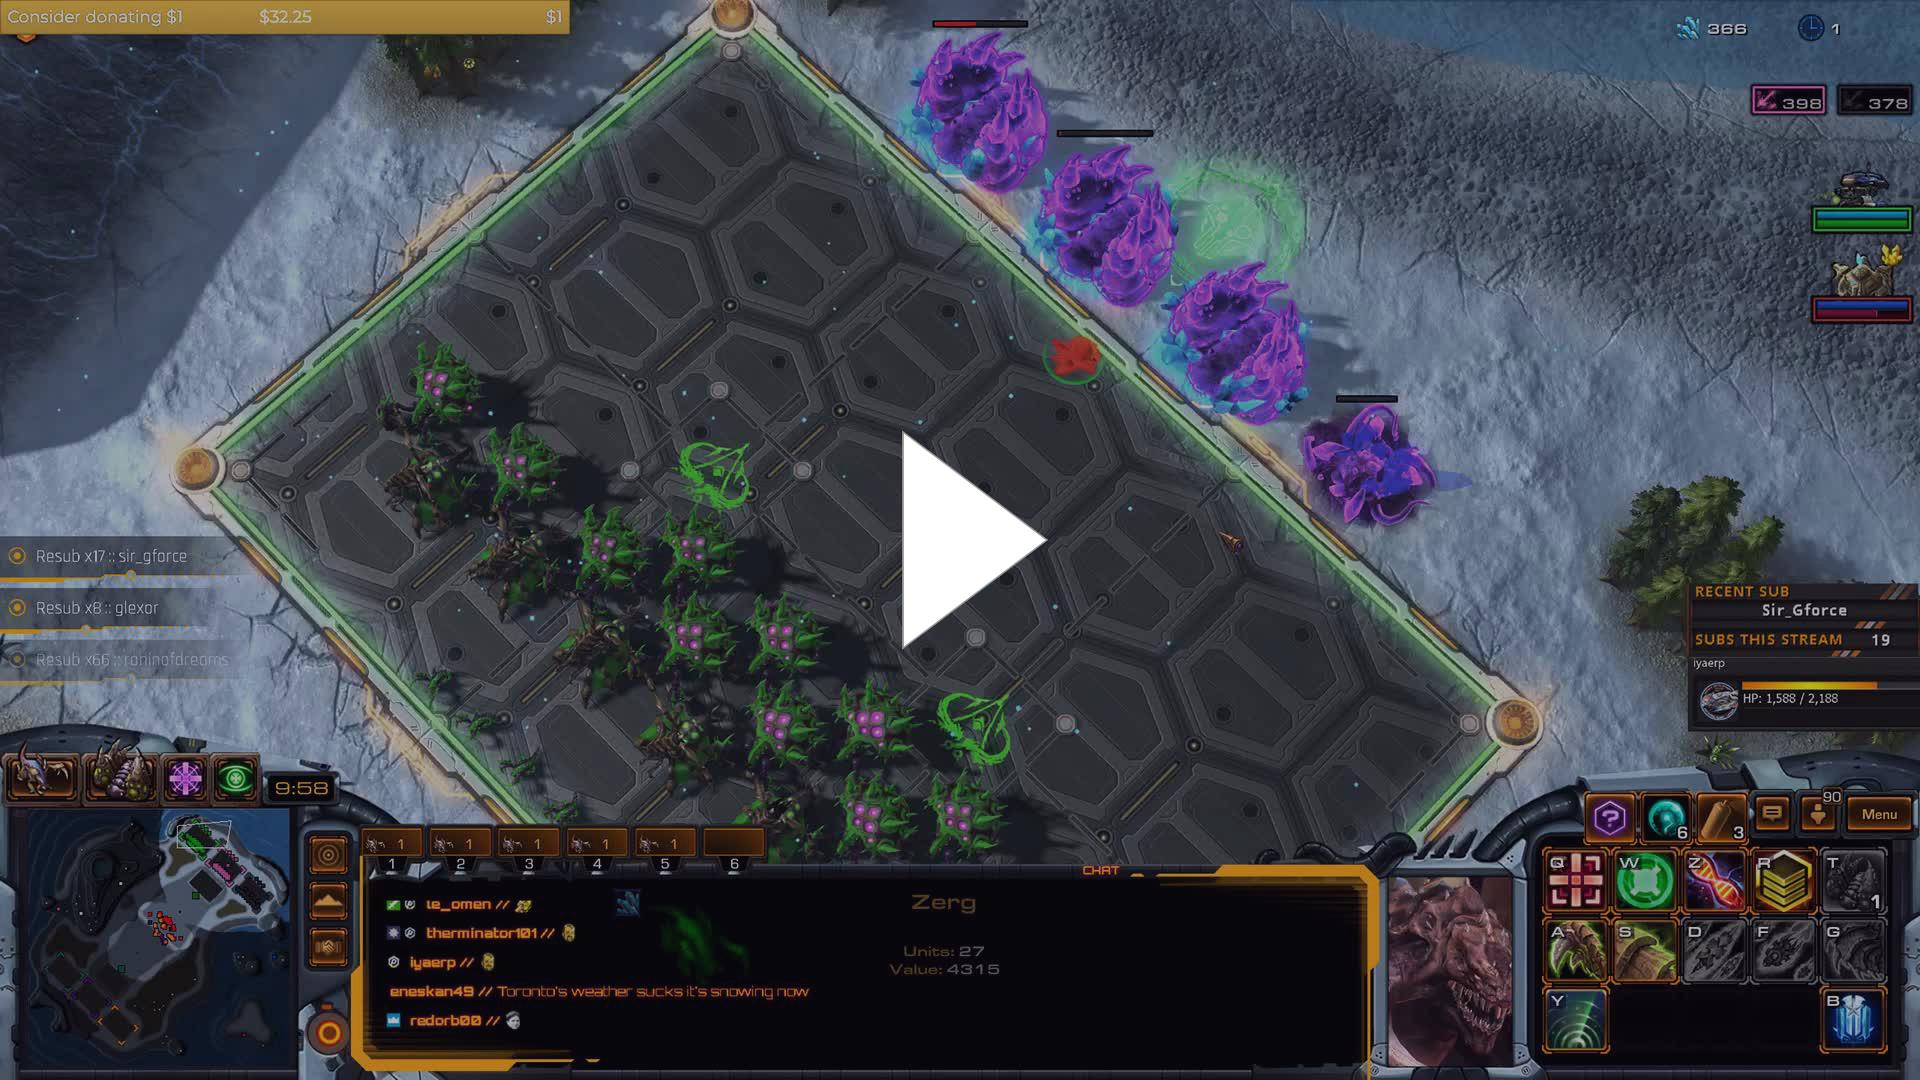 BASETRADETV - Direct Strike - Twitch